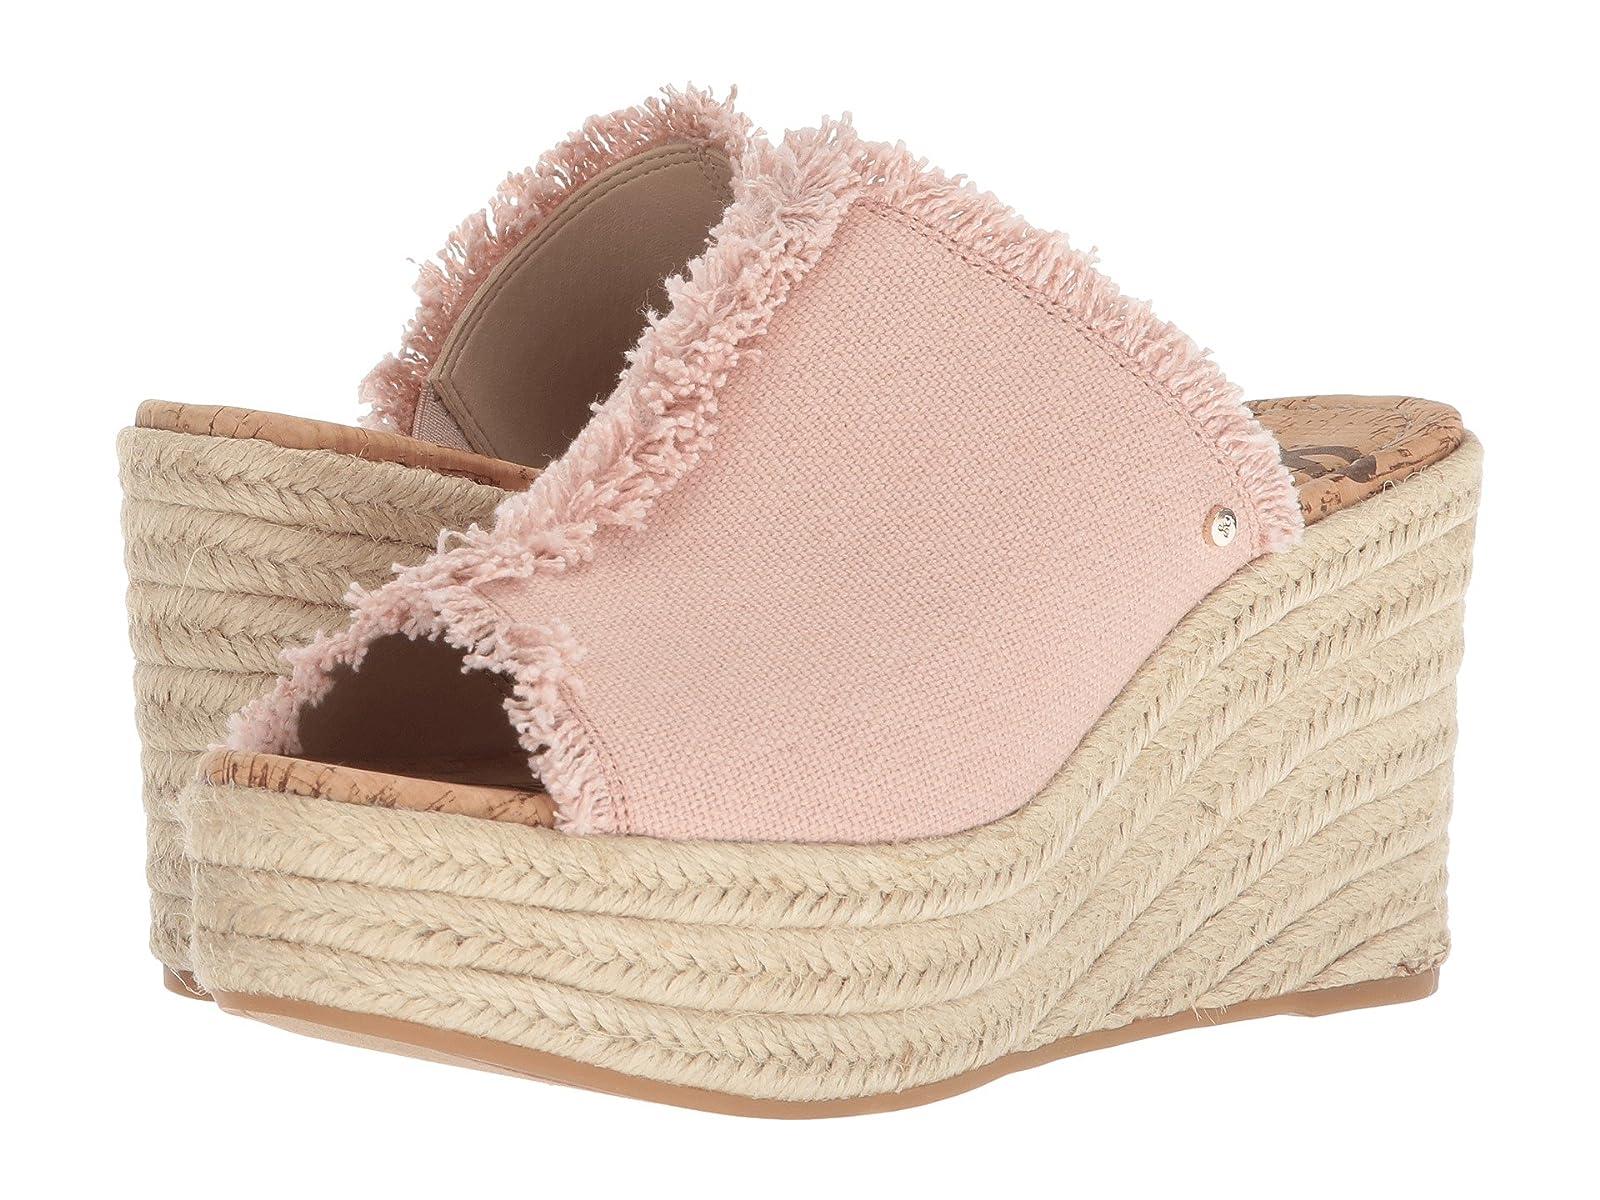 Sam Edelman DinaCheap and distinctive eye-catching shoes